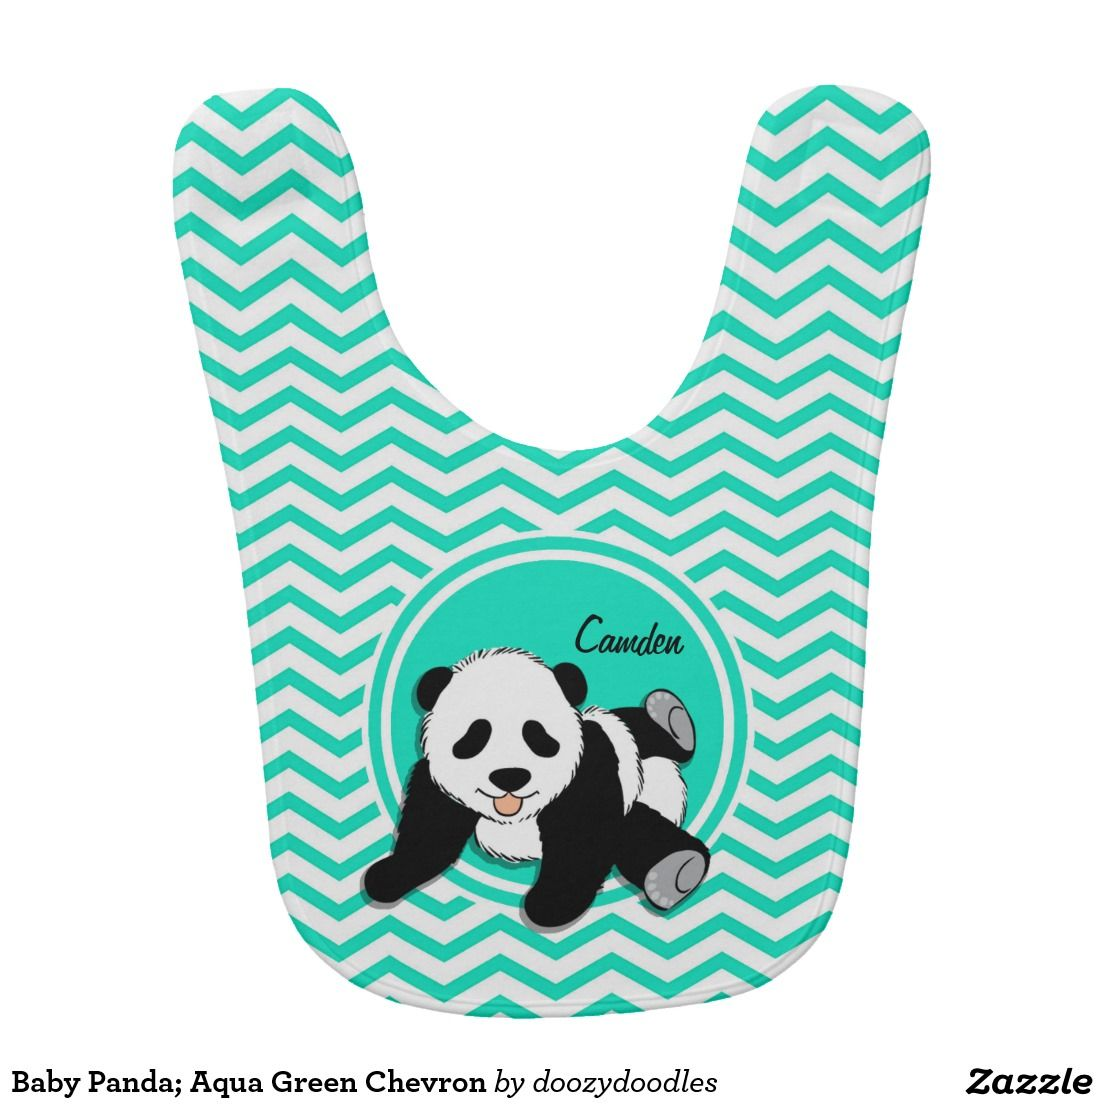 Baby Panda; Aqua Green Chevron